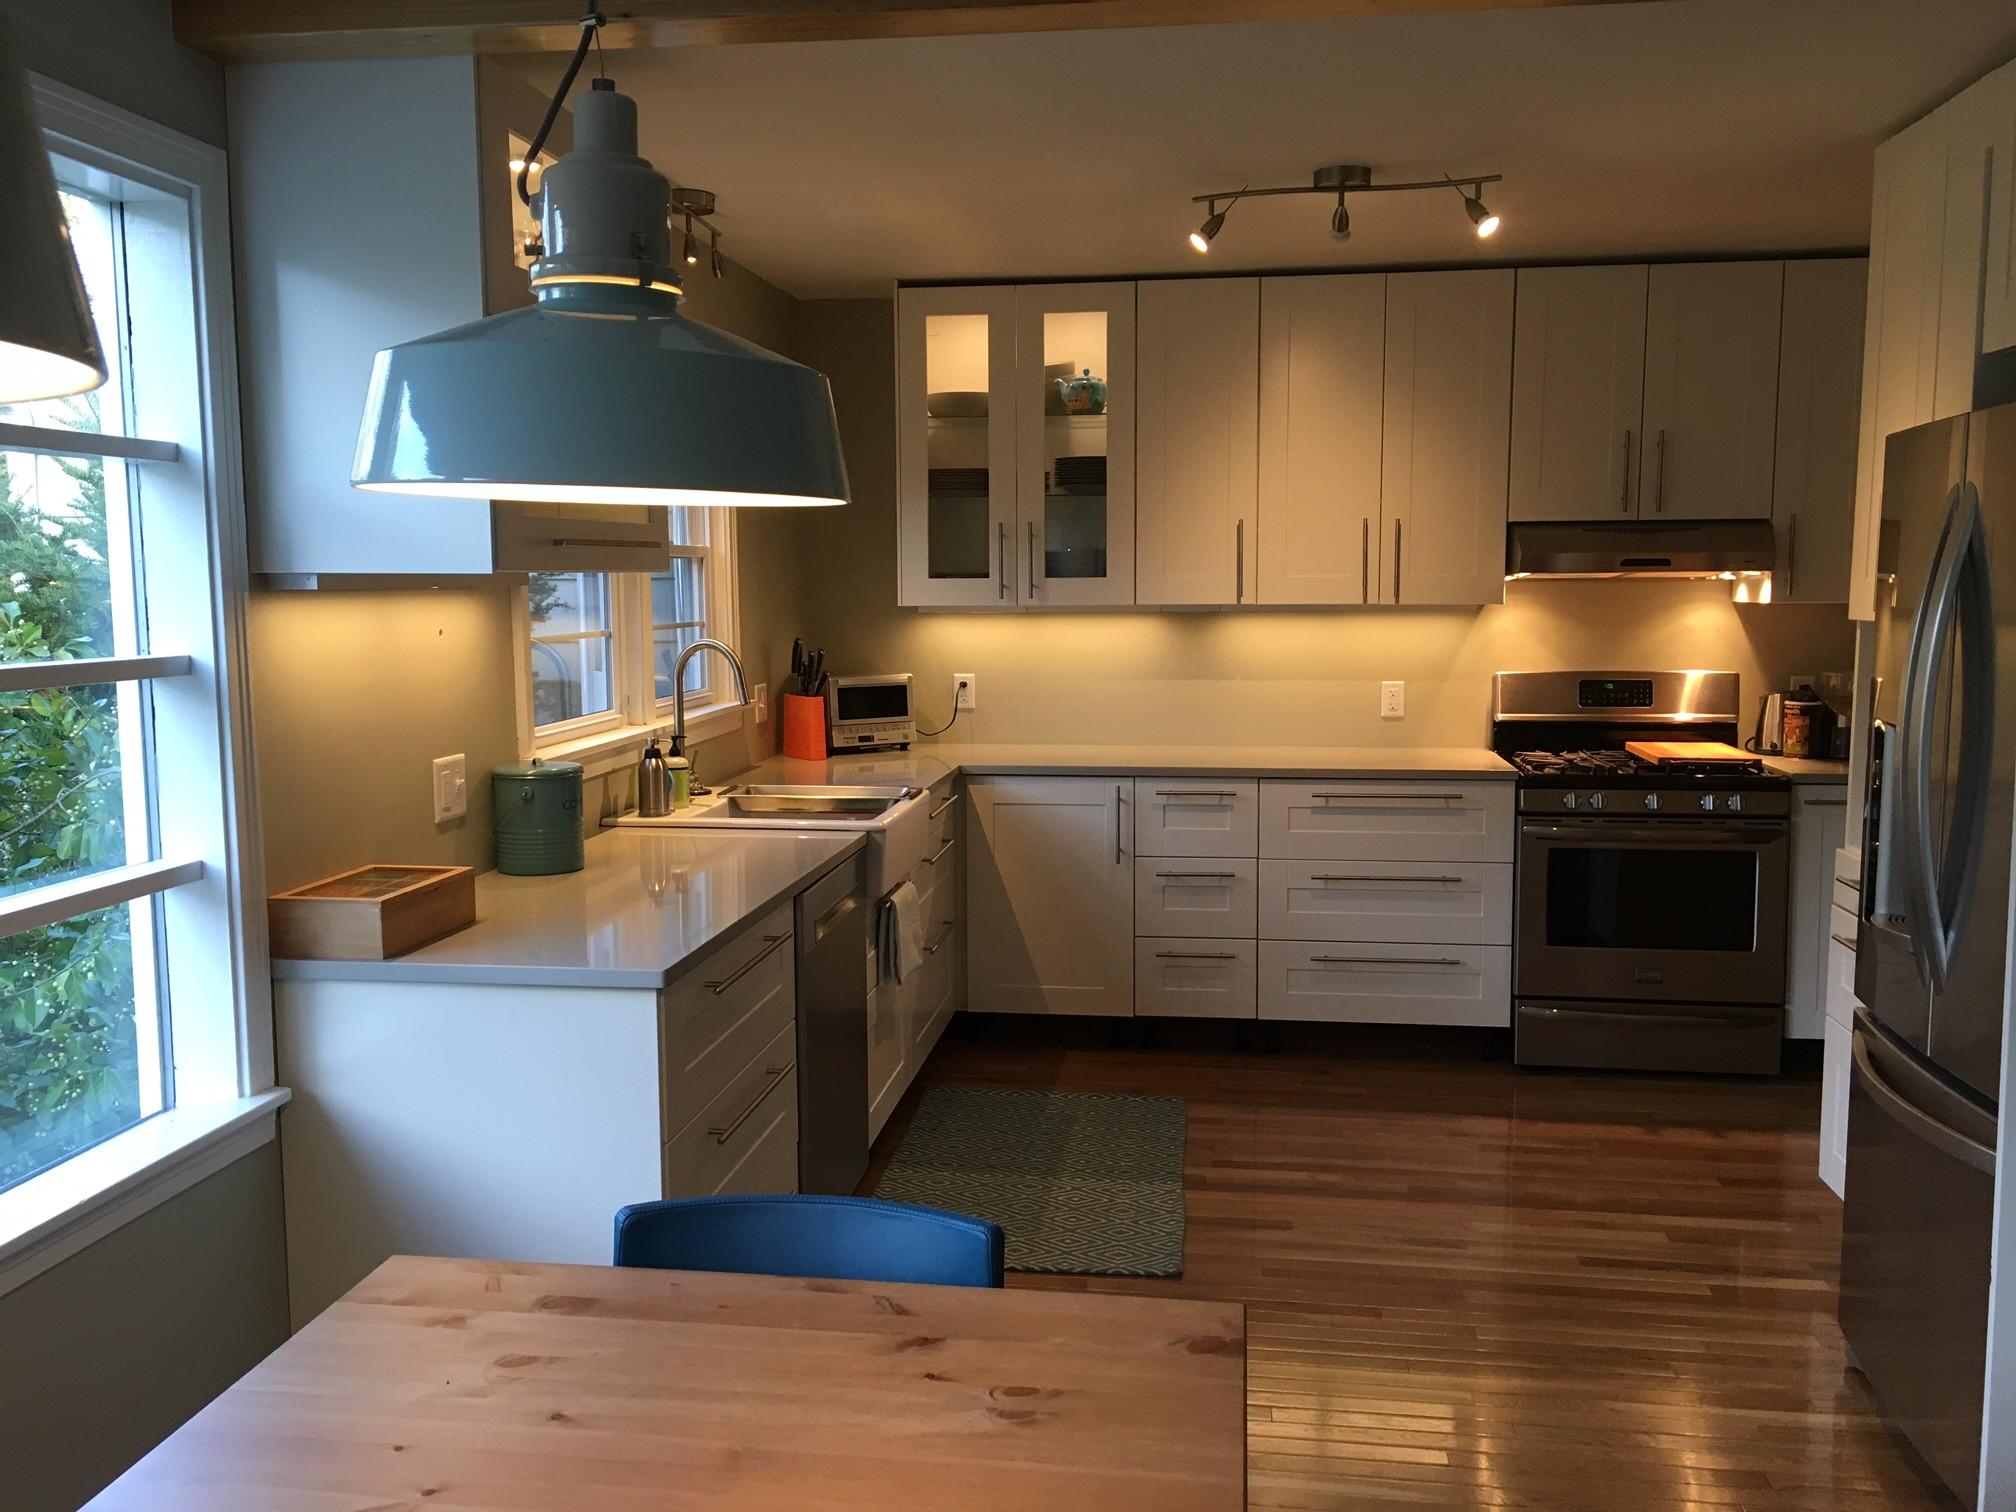 Ikea Kitchen Designer  A Gorgeous IKEA Kitchen Renovation in Upstate New York